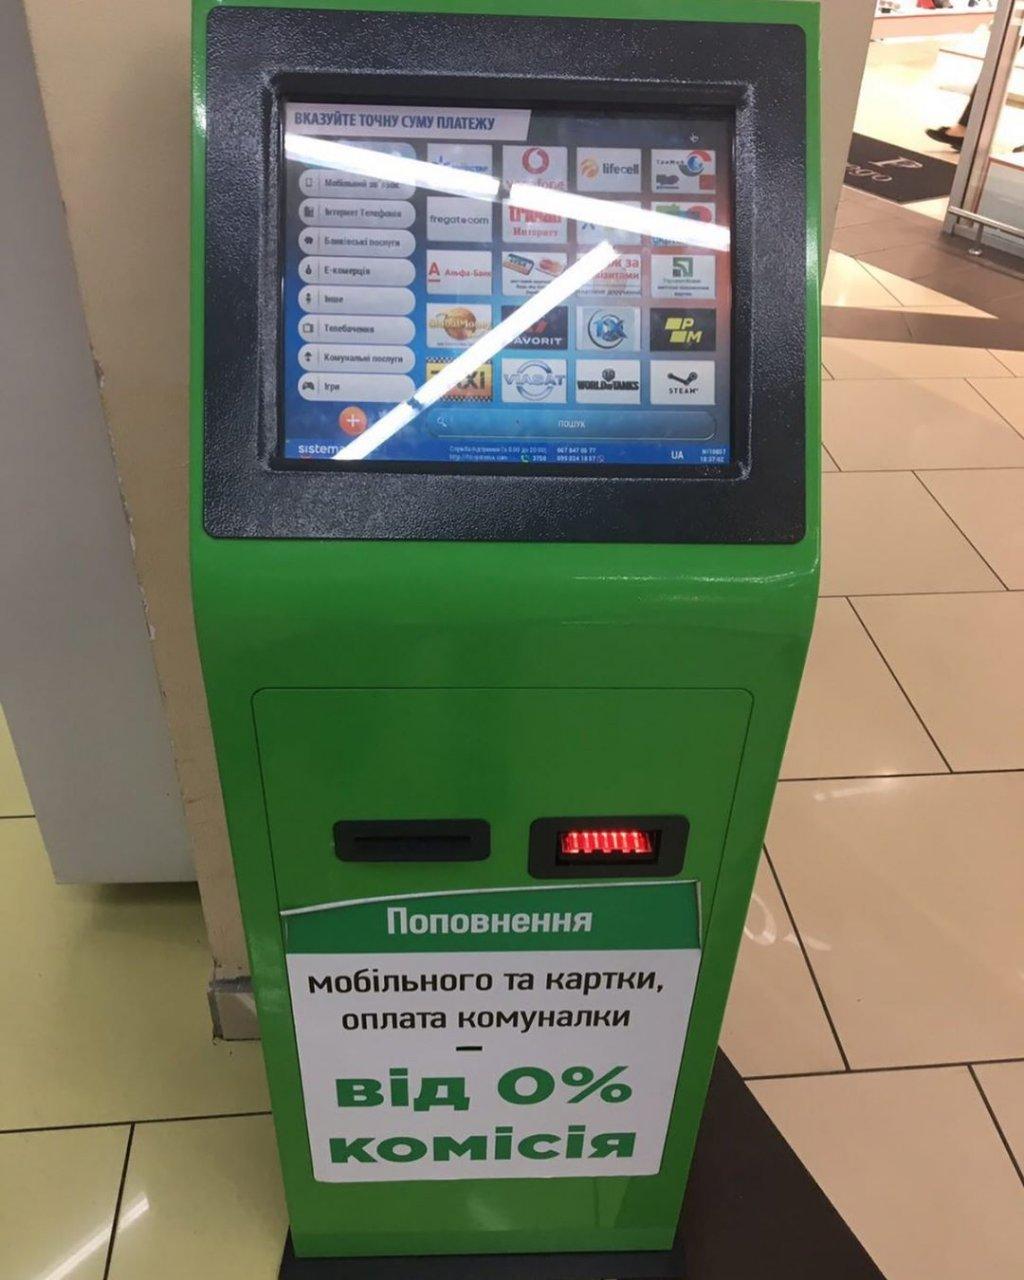 Moneybox.net.ua платежные терминалы - nowikoffgrisch@yandex.ua